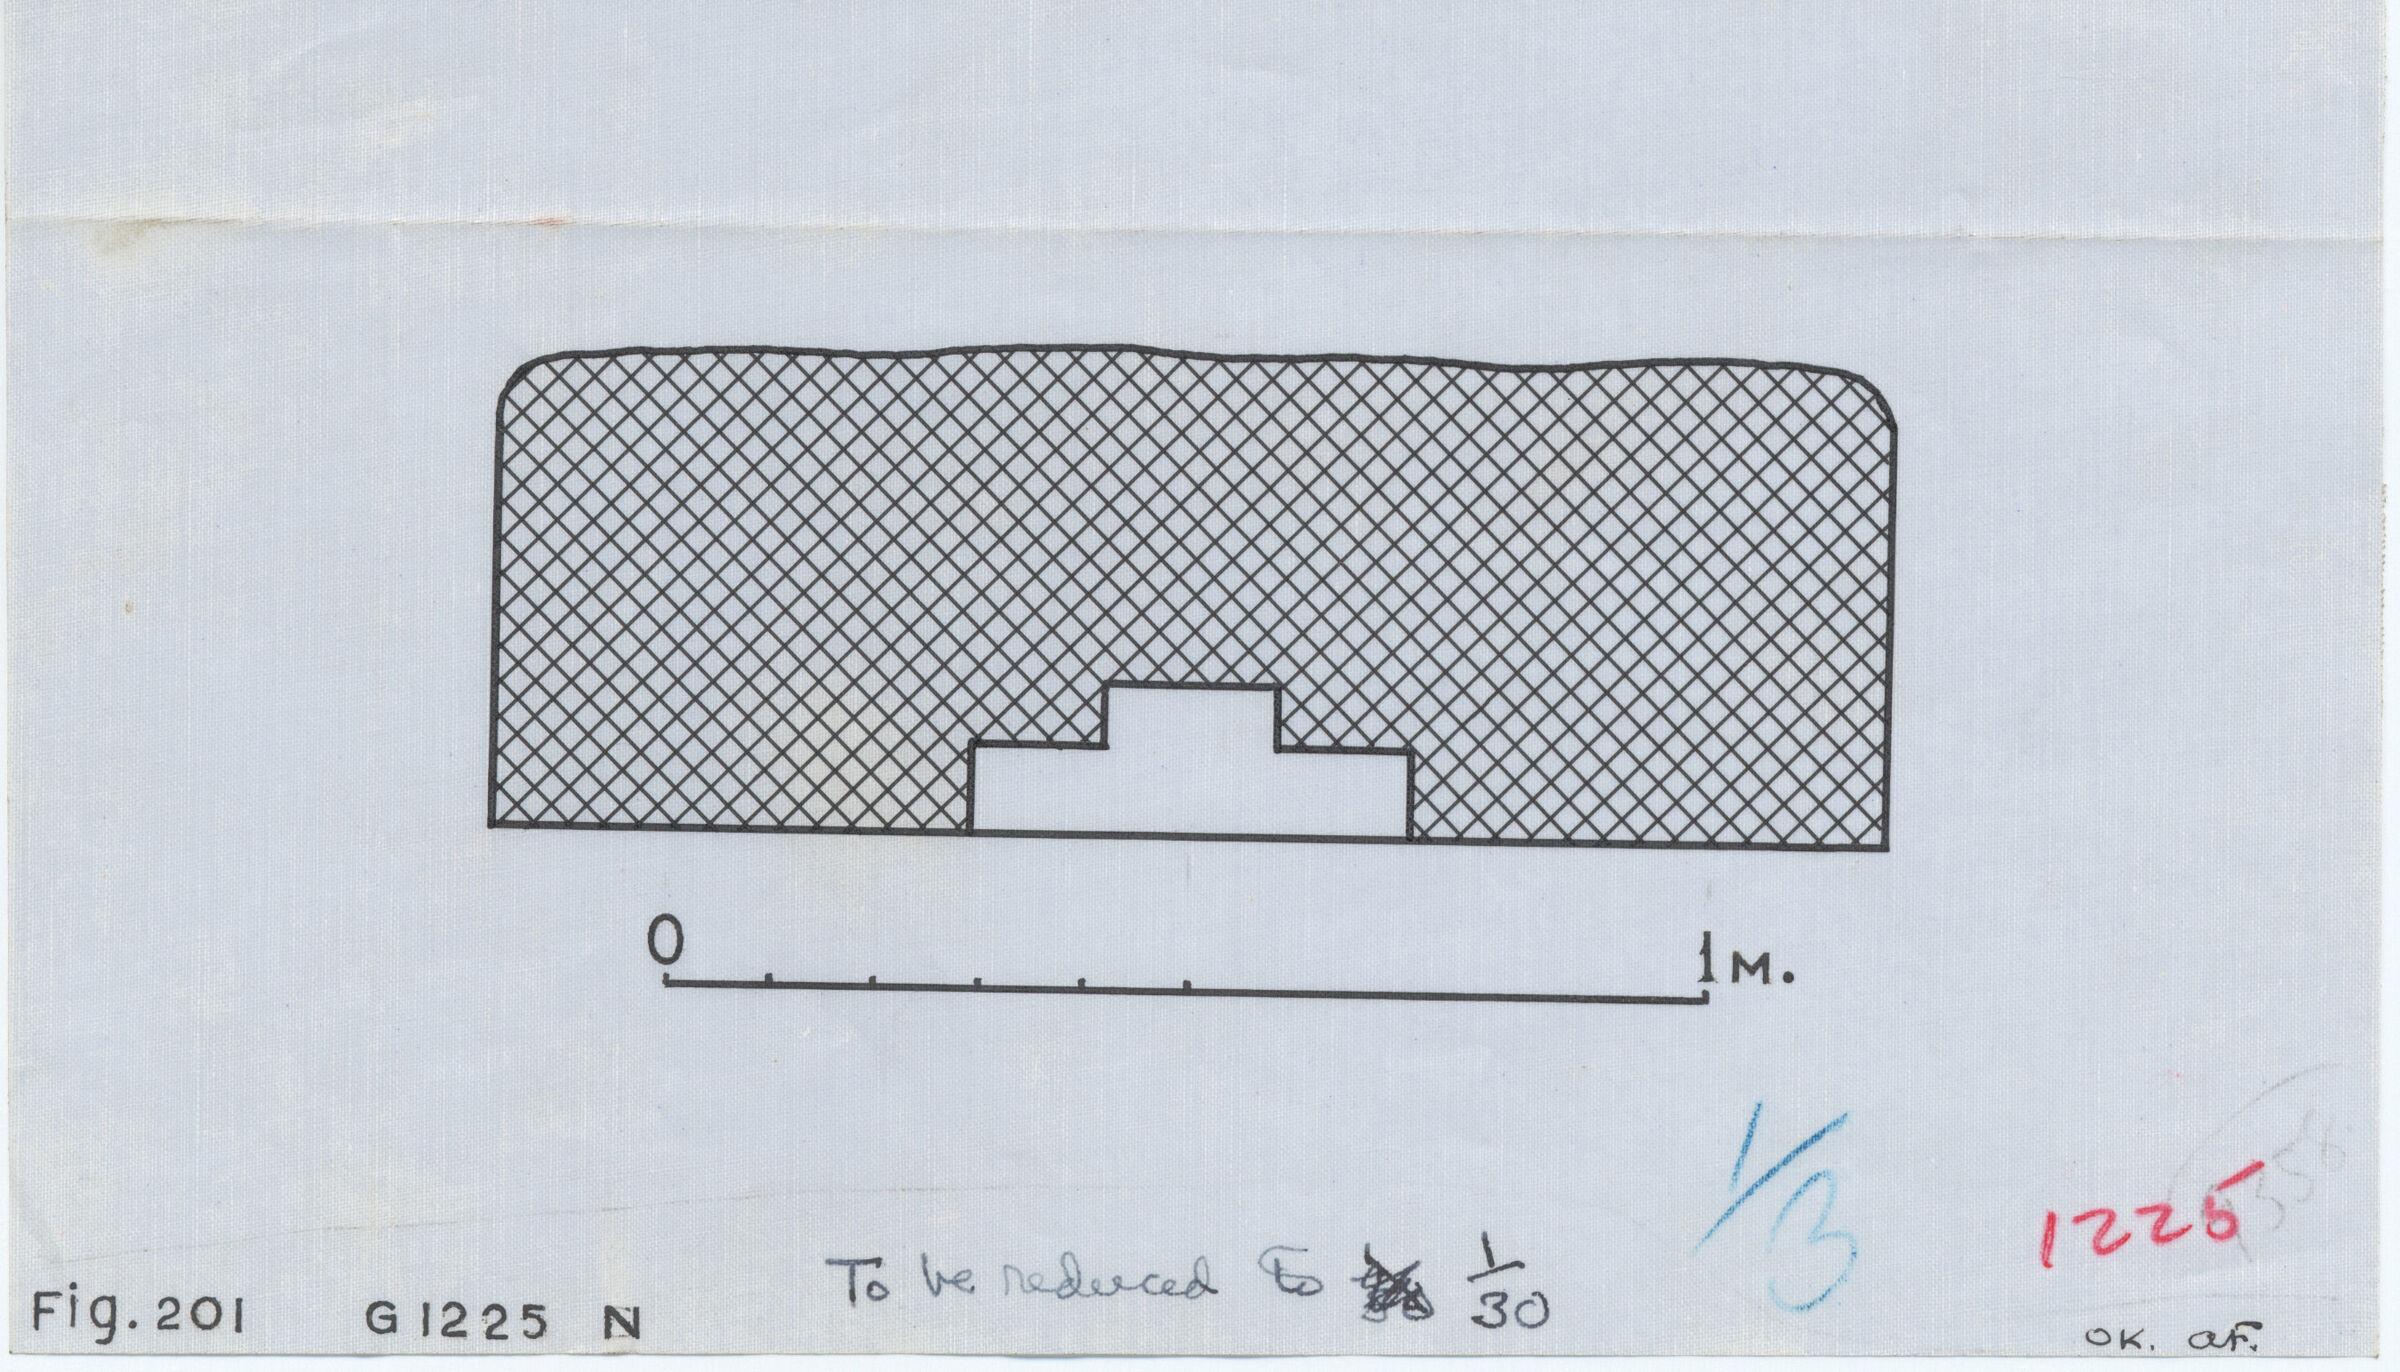 Maps and plans: G 1225, Plan of north niche (= niche of G 1225-Annex chapel)